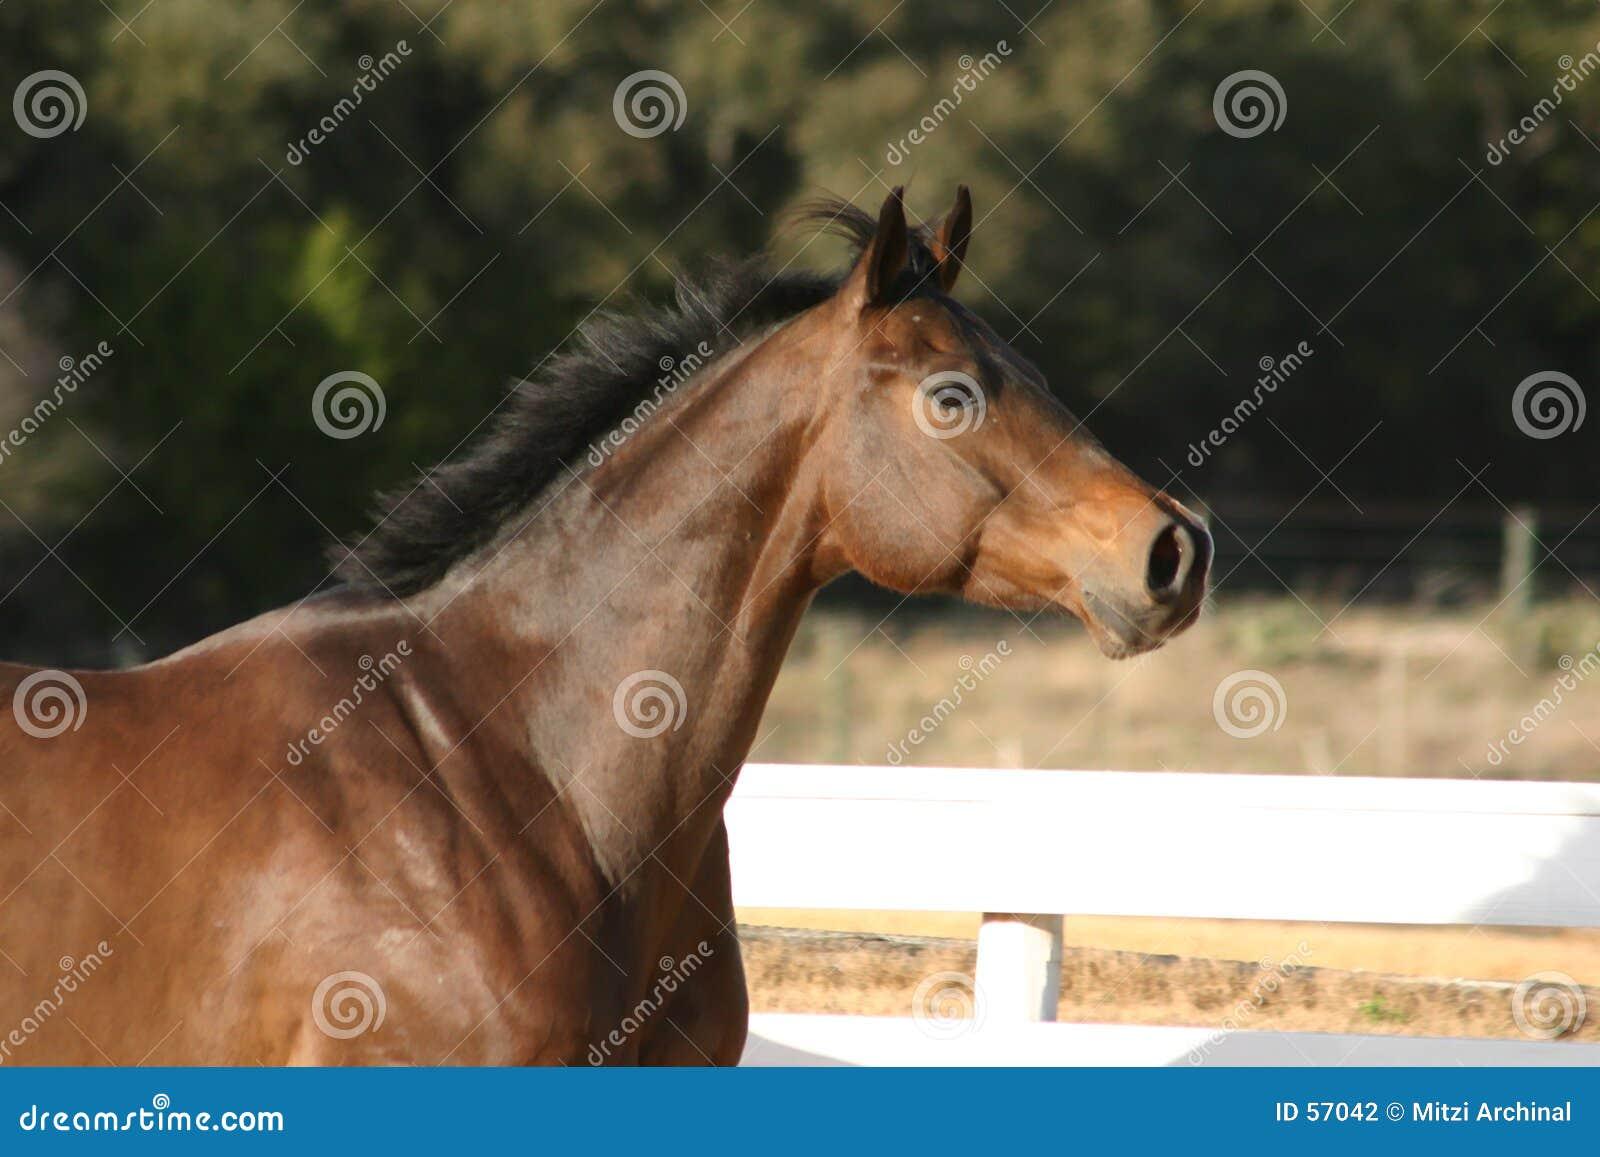 Download Headshot άλογο στοκ εικόνες. εικόνα από horsey, μάιν, φοραδίτσα - 57042